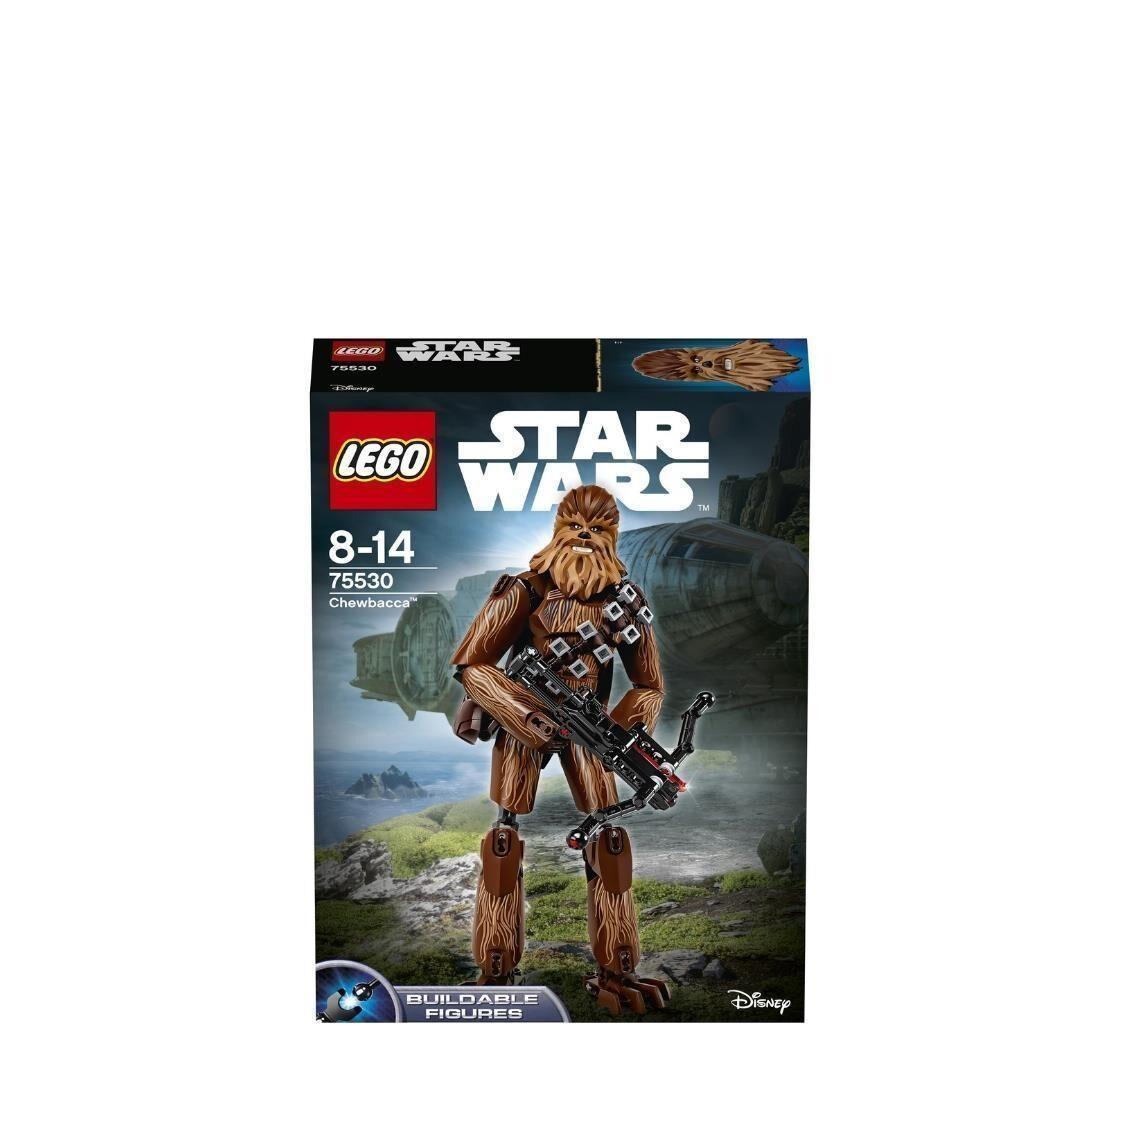 LEGO Star Wars - Chewbacca 75530 V29